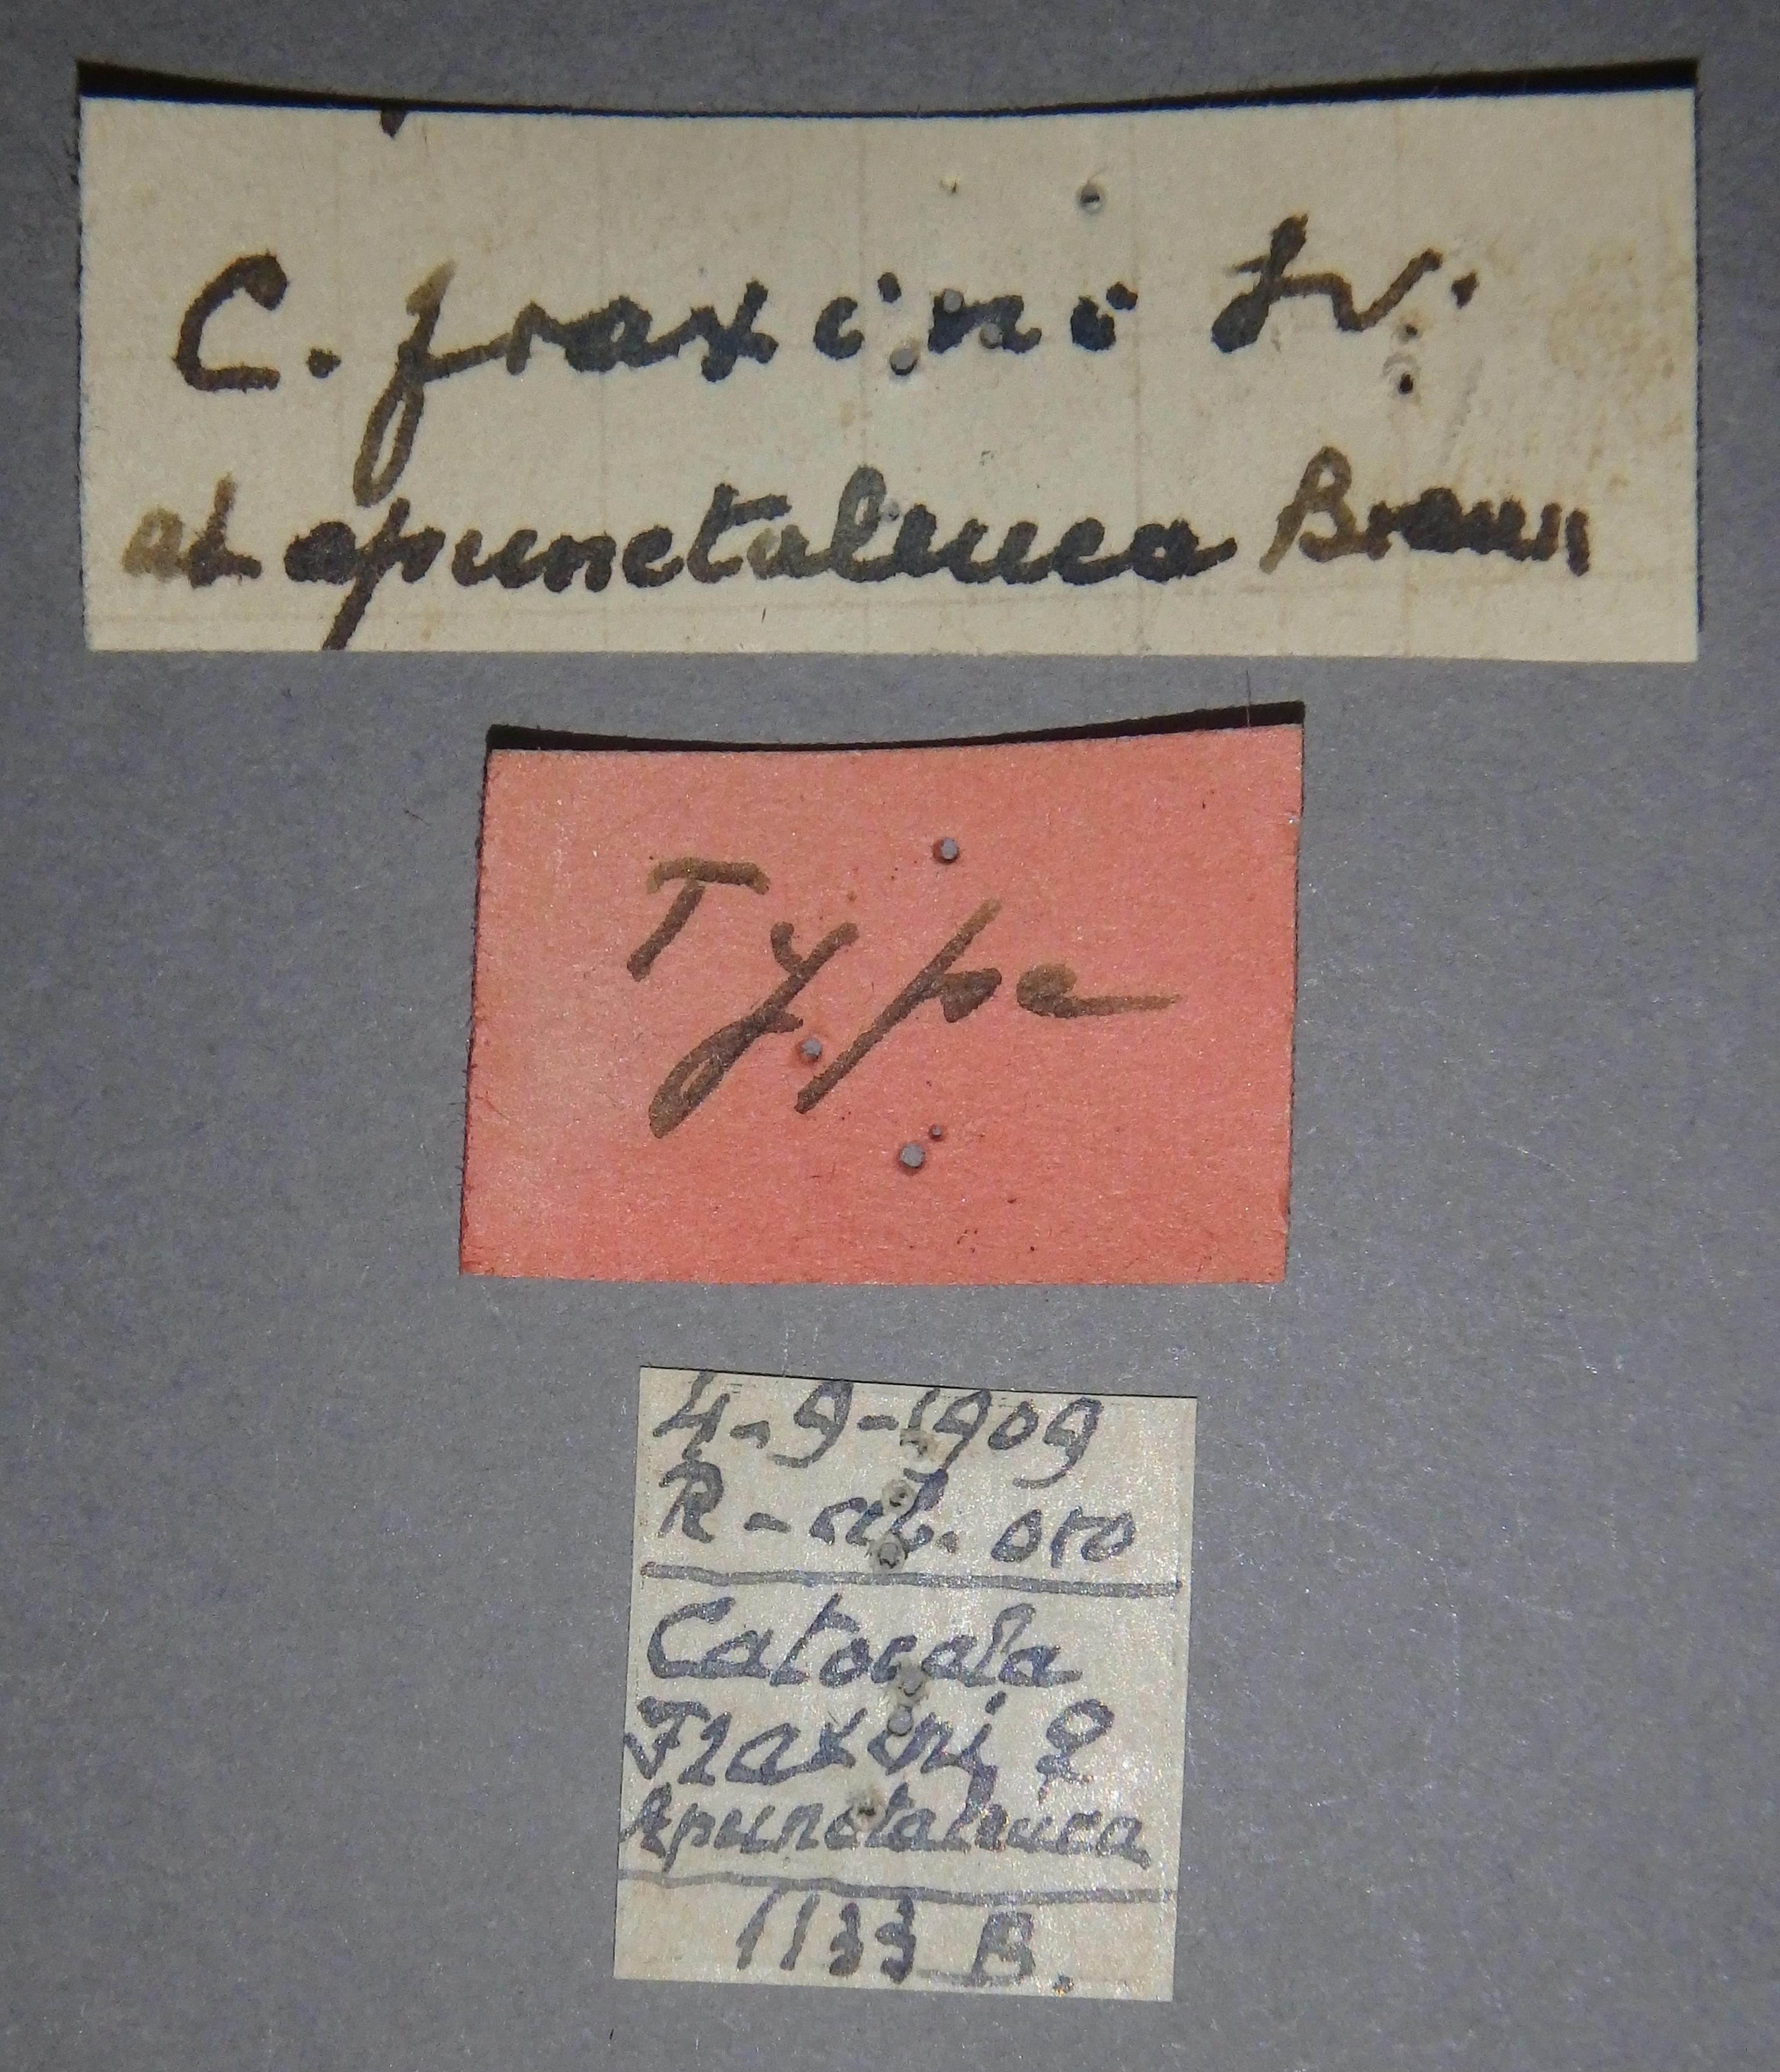 Catocala fraxini ab apunctaleuca t Lb.JPG